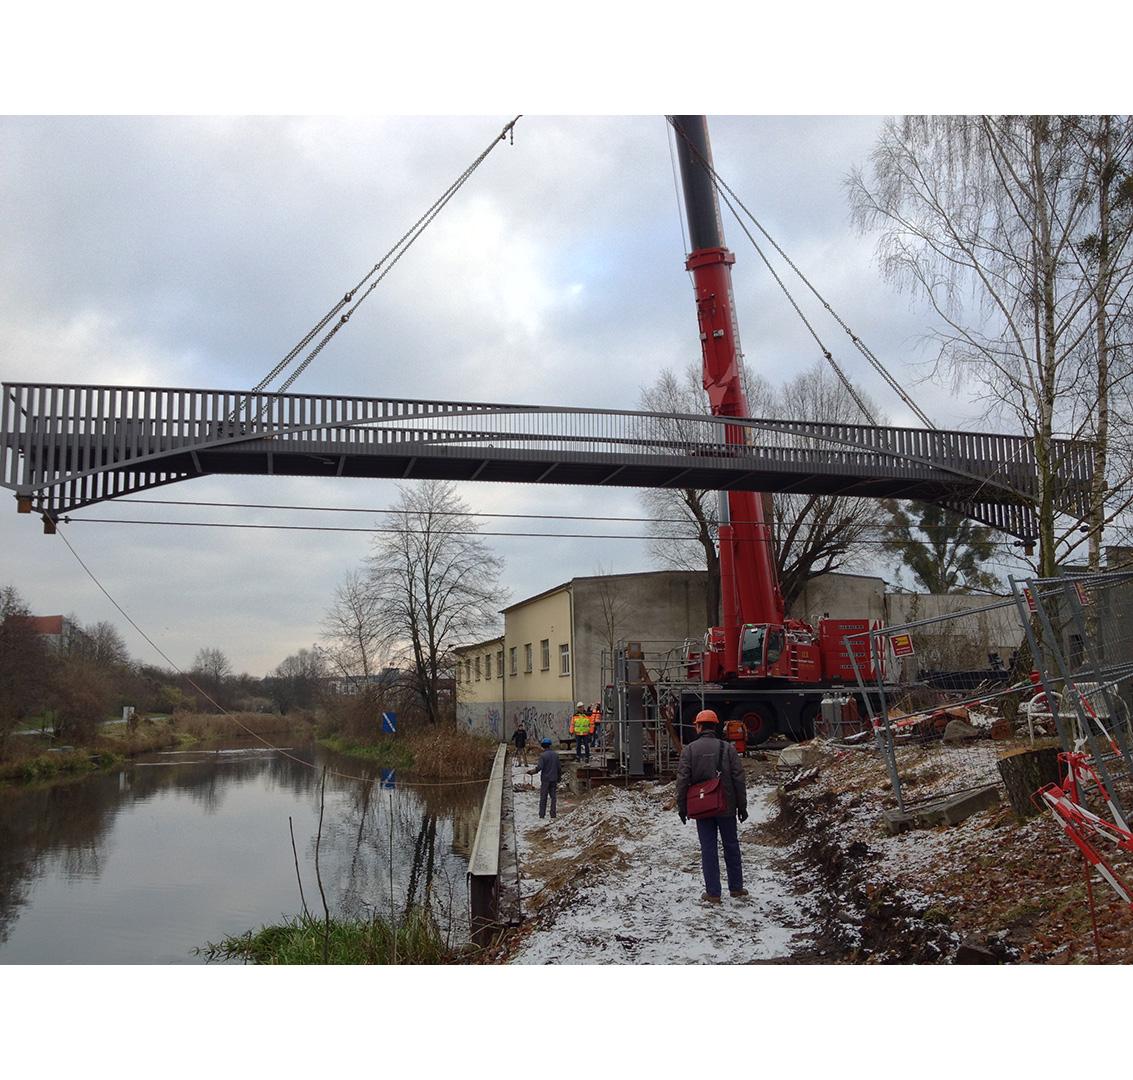 Leibnizbrücke, Eberswalde, Bau | Sauerzapfe Architekten